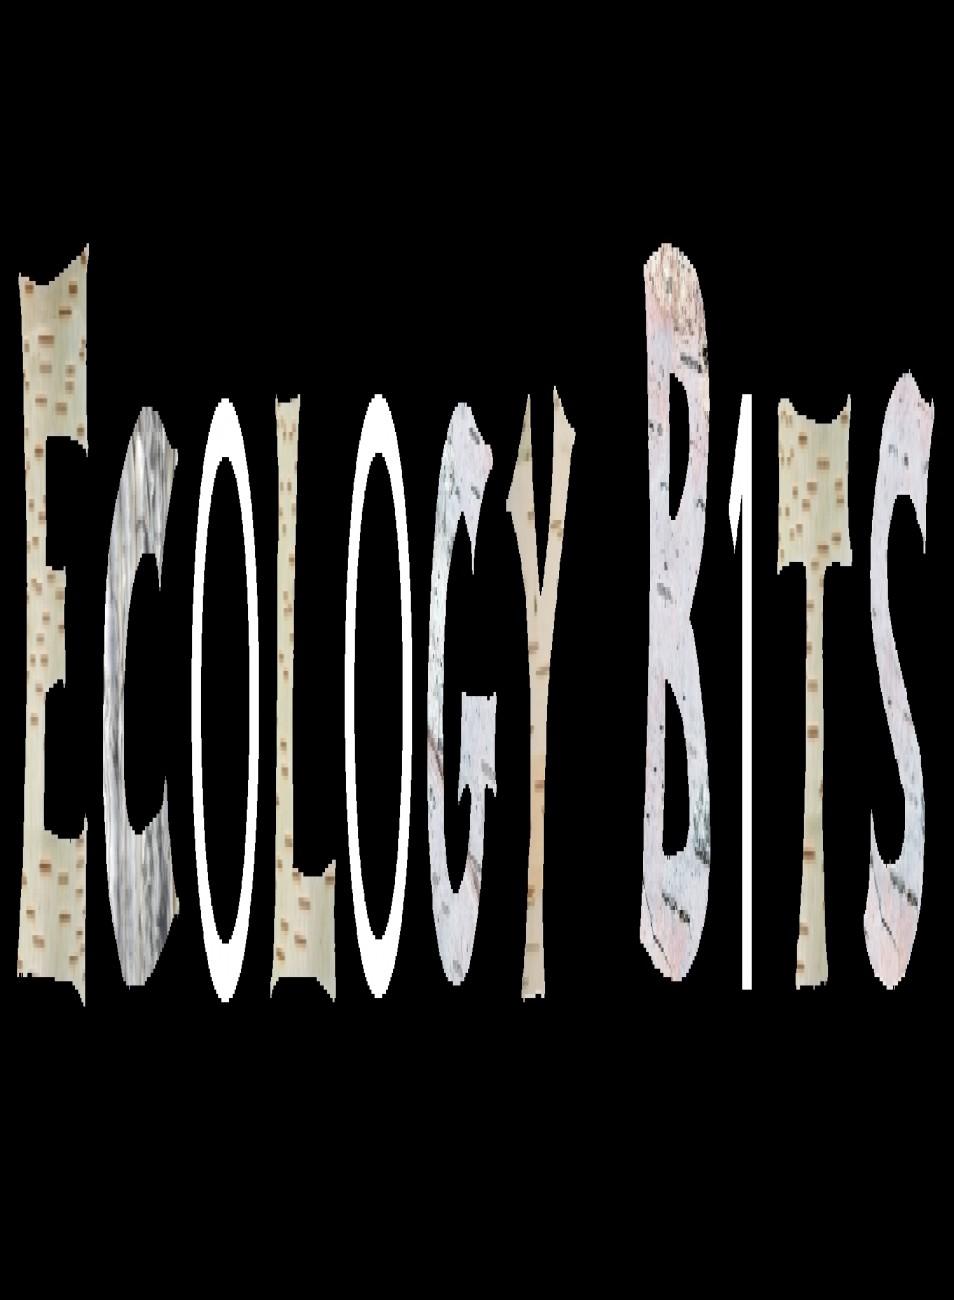 ecology dissertations